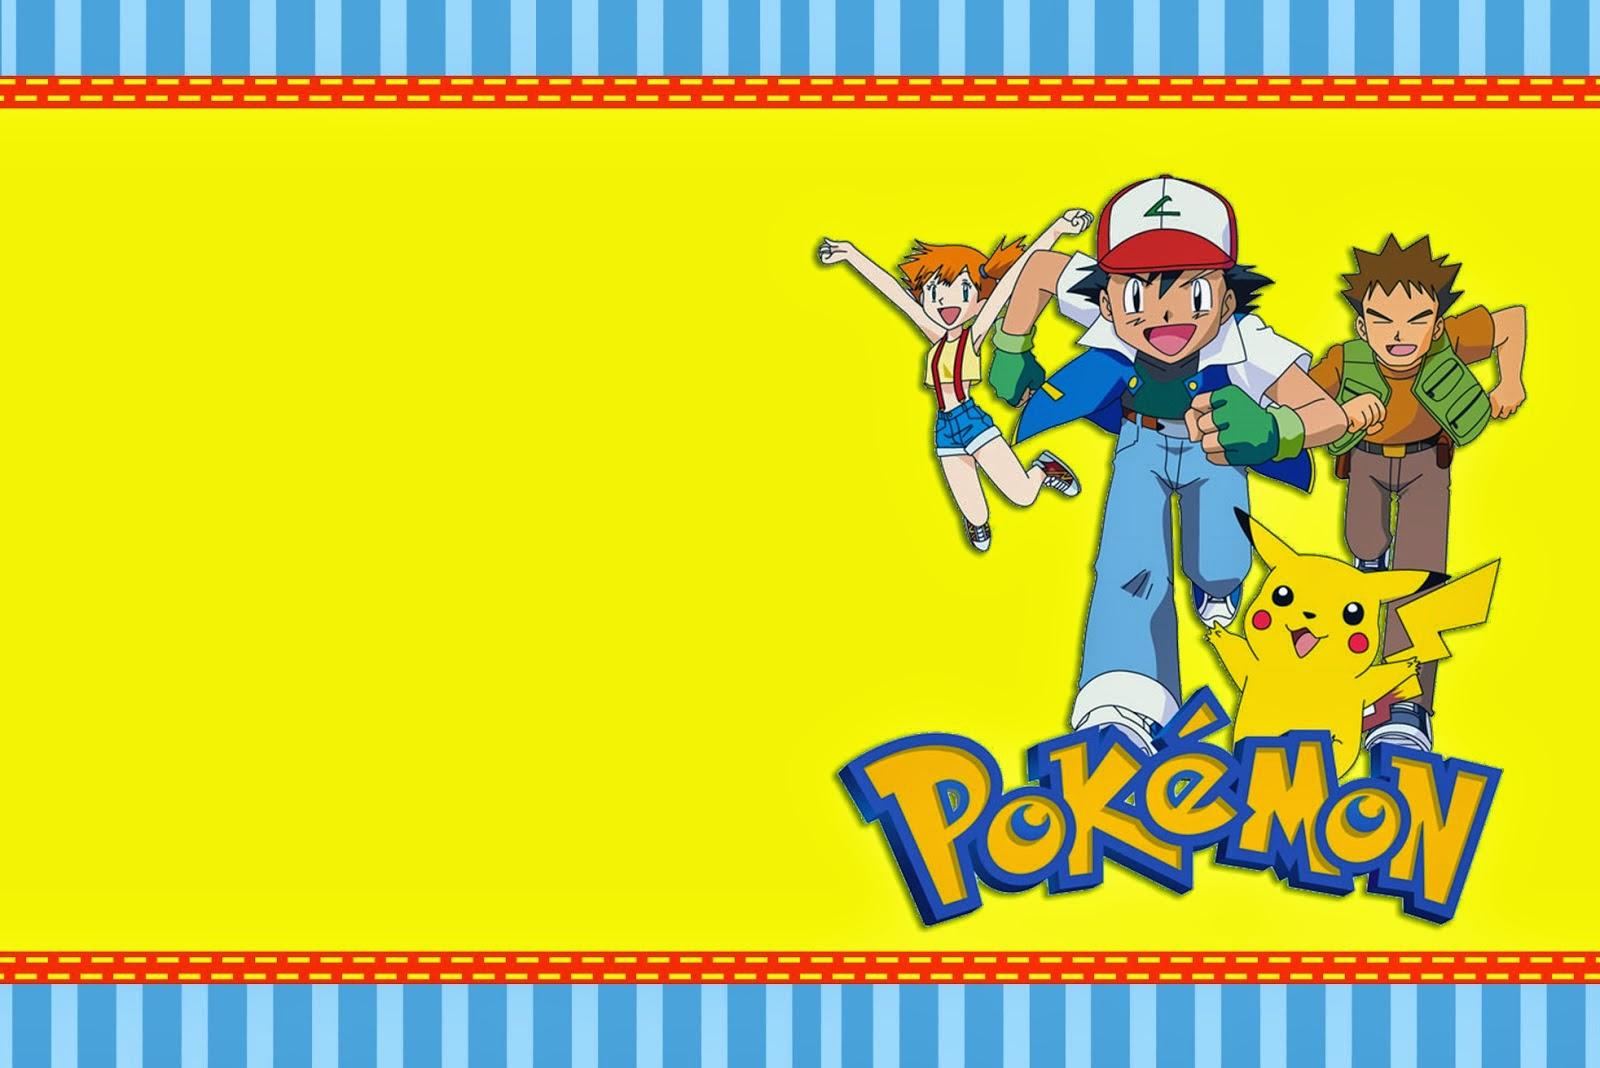 Pokemon: Free Printable Invitations. - Oh My Fiesta! For Geeks - Free Printable Pokemon Birthday Invitations